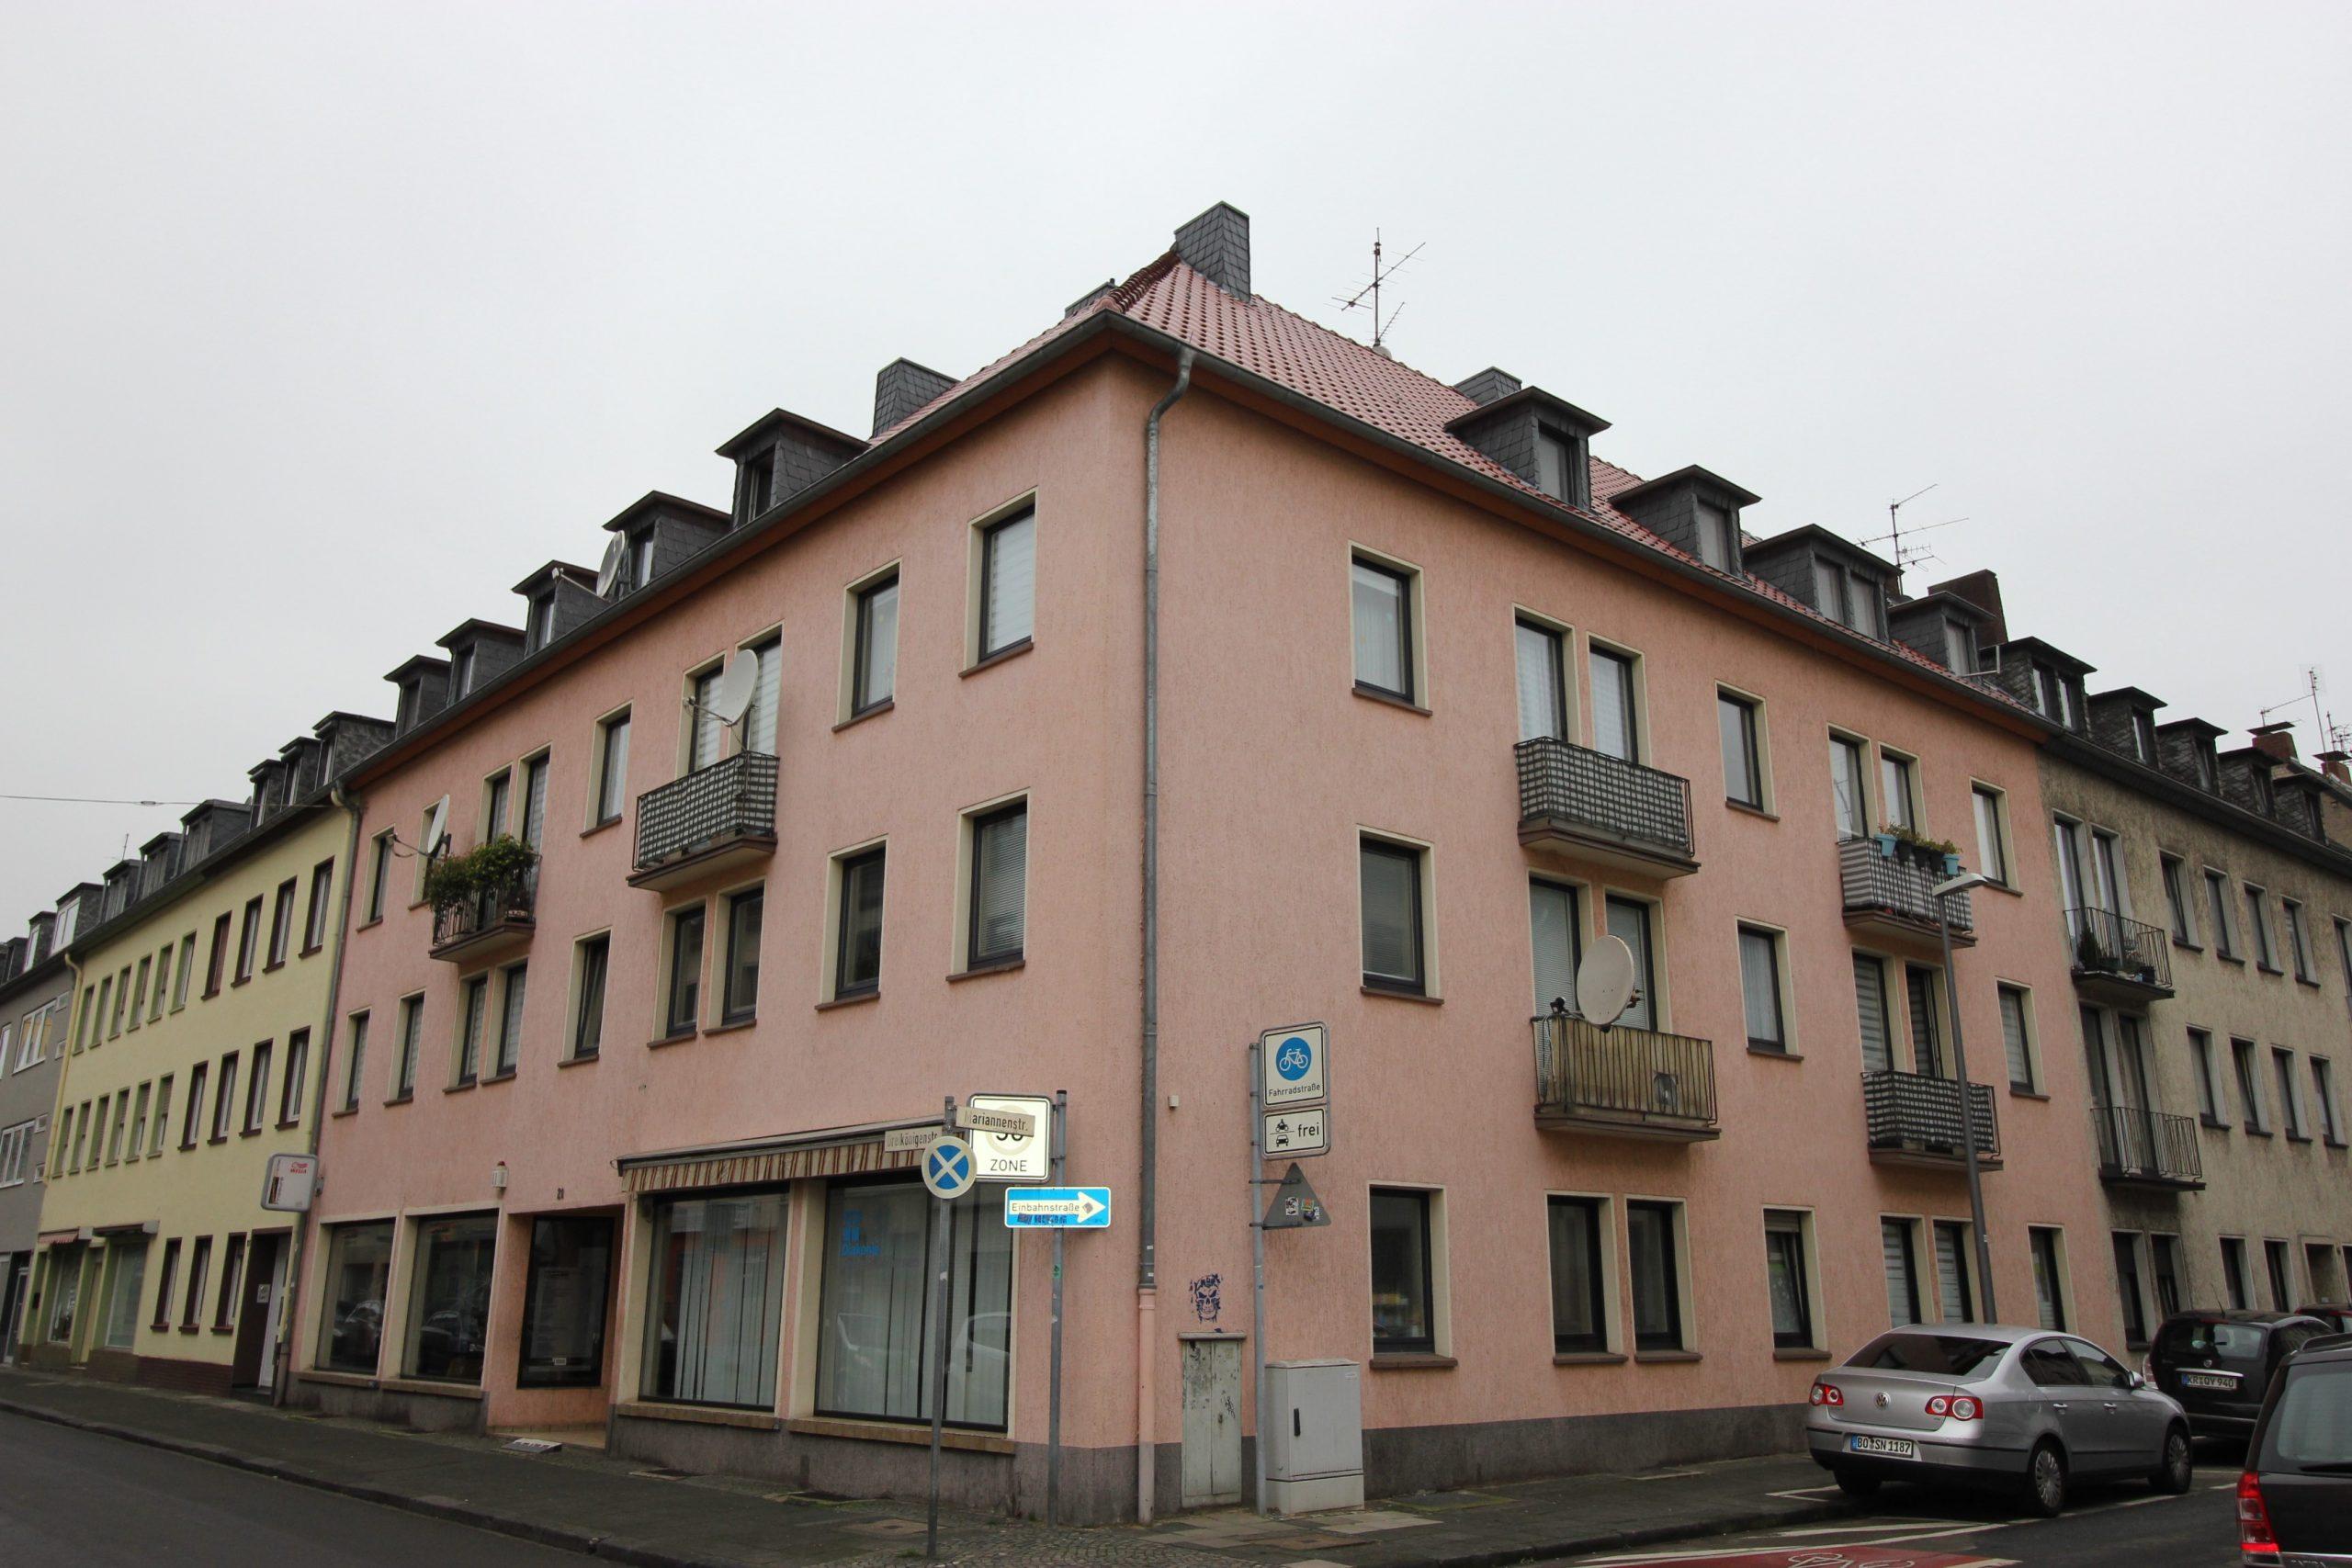 Hausverwaltung Krefeld - Dreikönigenstraße WEG-Verwalter